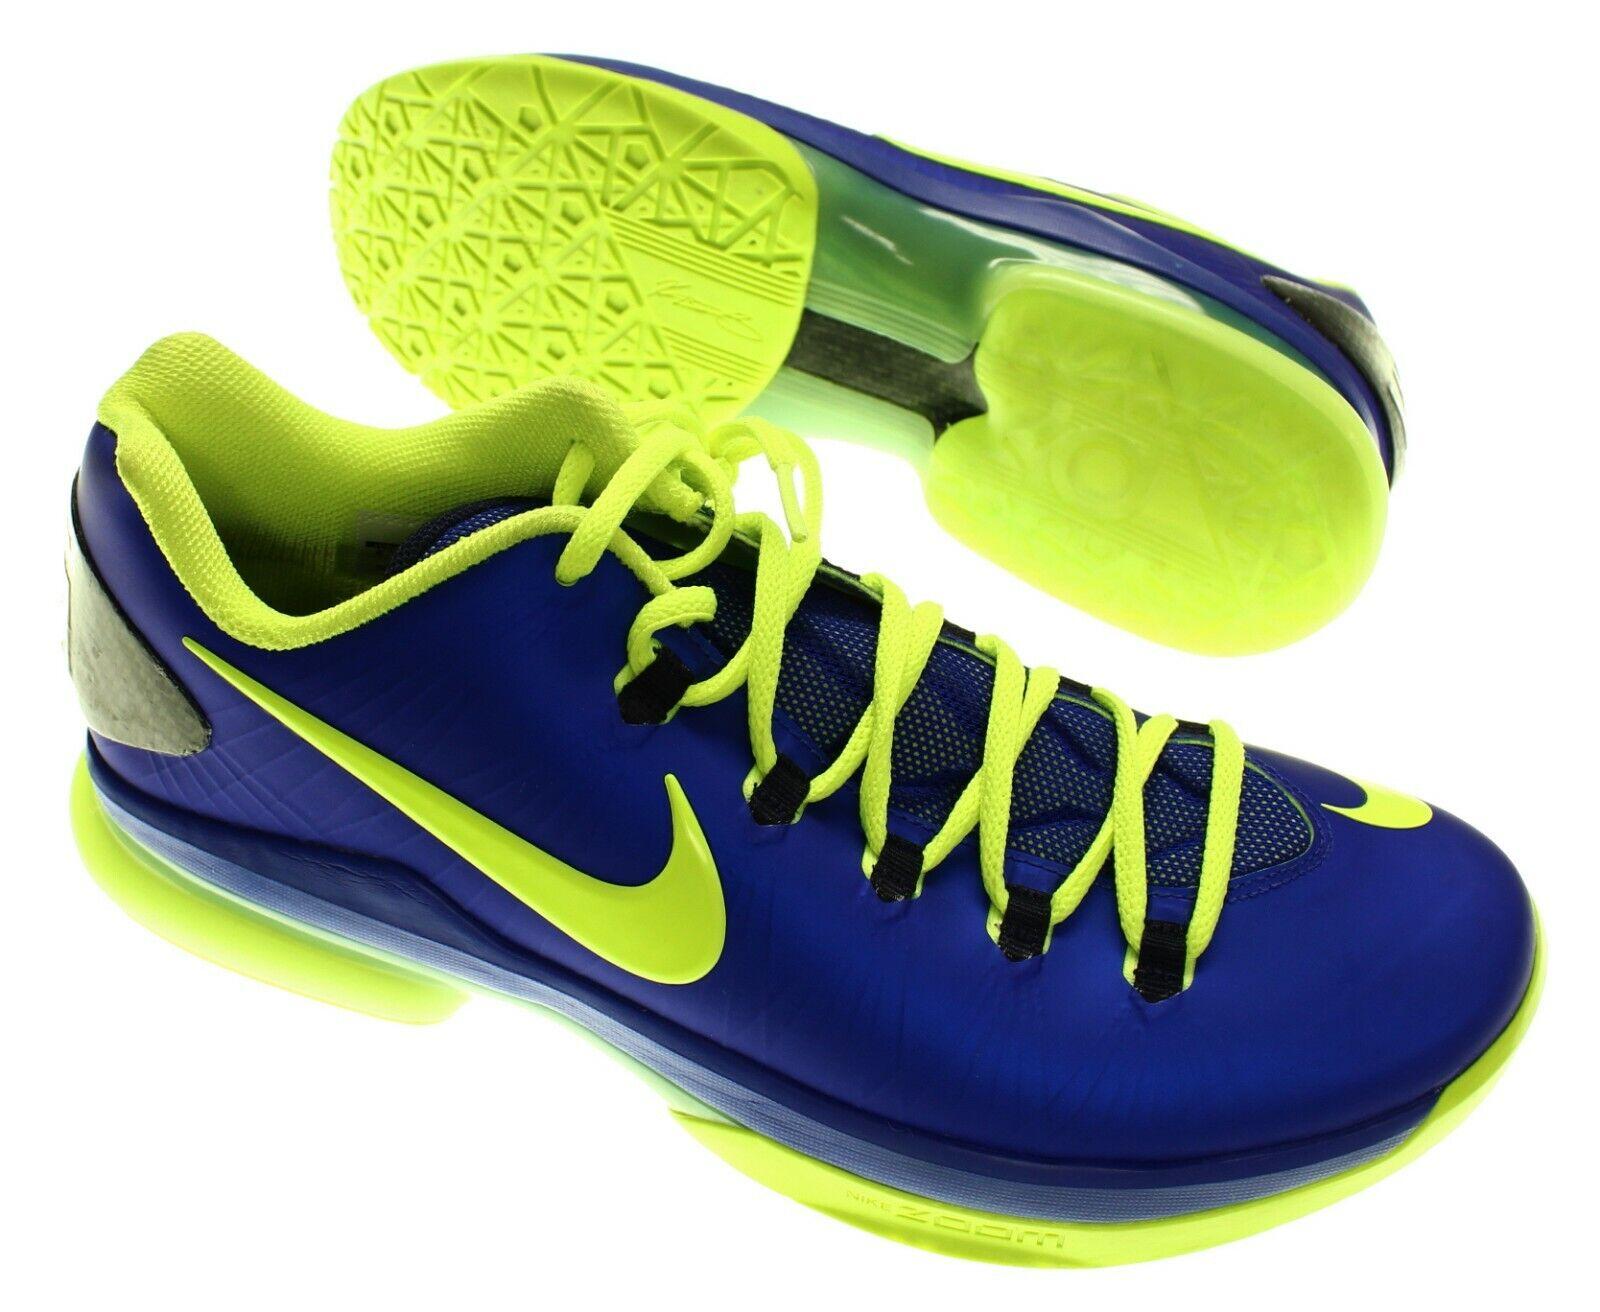 NIKE Men's 'KD V ELITE SUPERHERO' bluee Green LOW TOP BASKETBALL SNEAKER - US 9.5